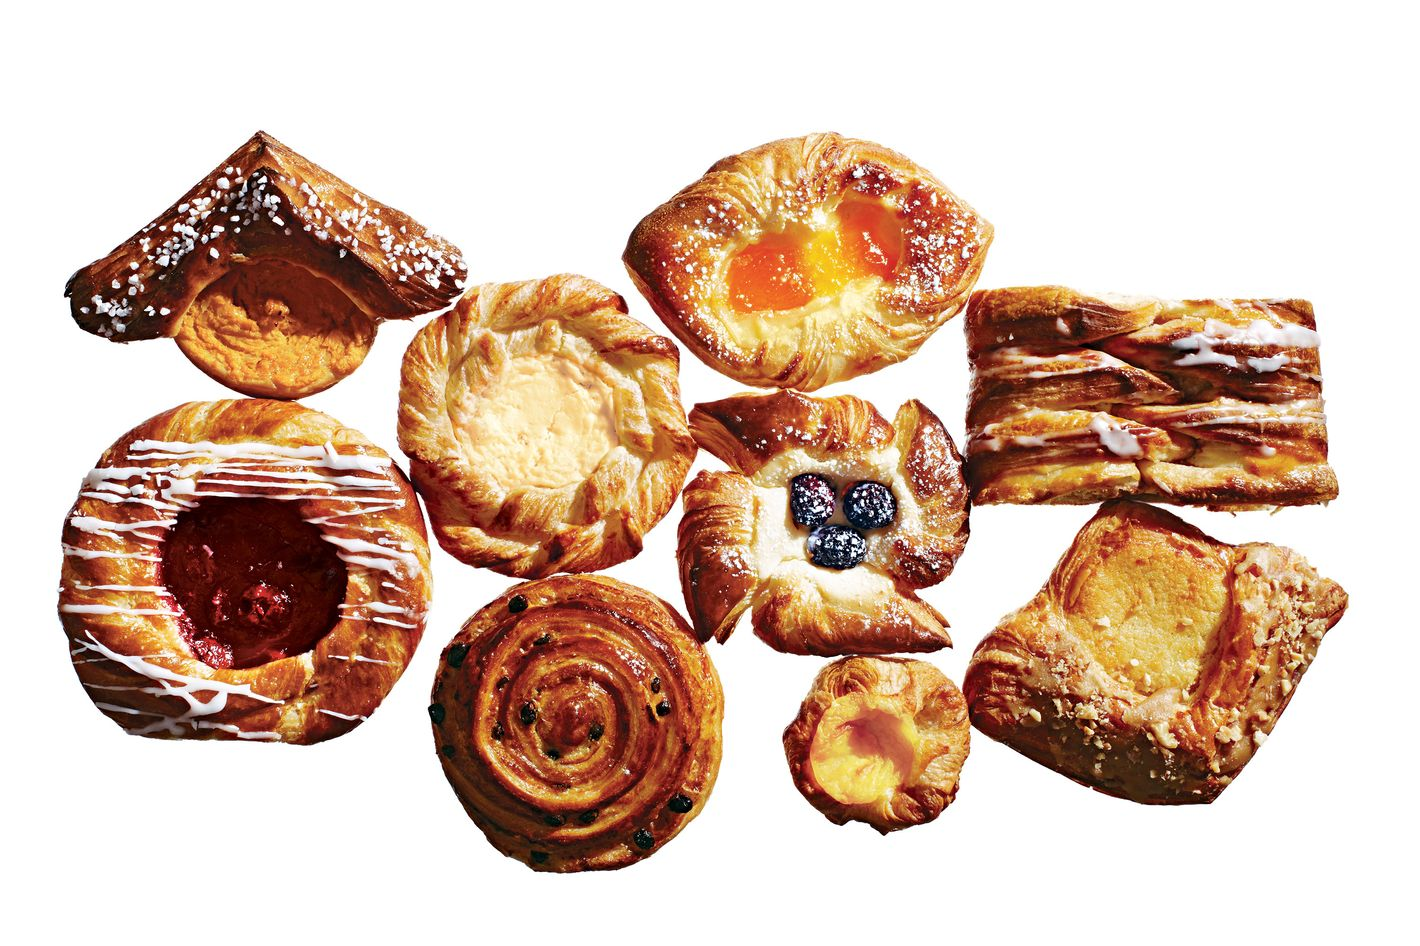 http://pixel.nymag.com/imgs/daily/grub/2013/03/21/21_pastries.jpg